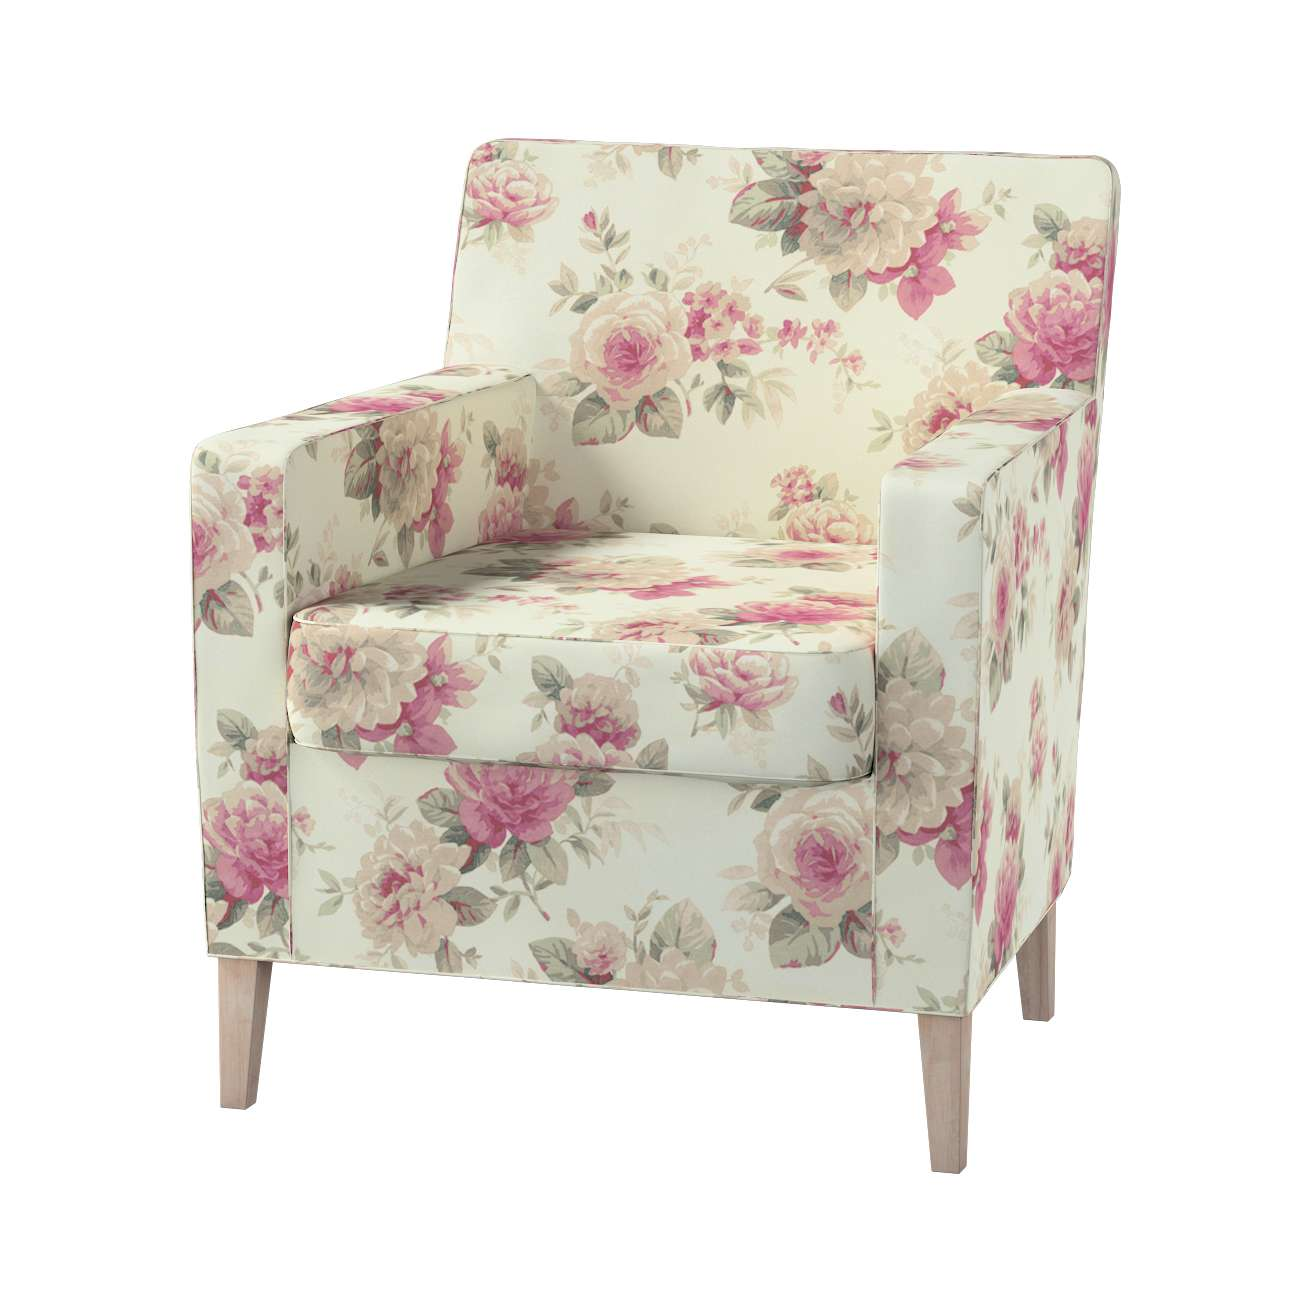 Pokrowiec na fotel Karlstad Fotel  Karlstad w kolekcji Mirella, tkanina: 141-07